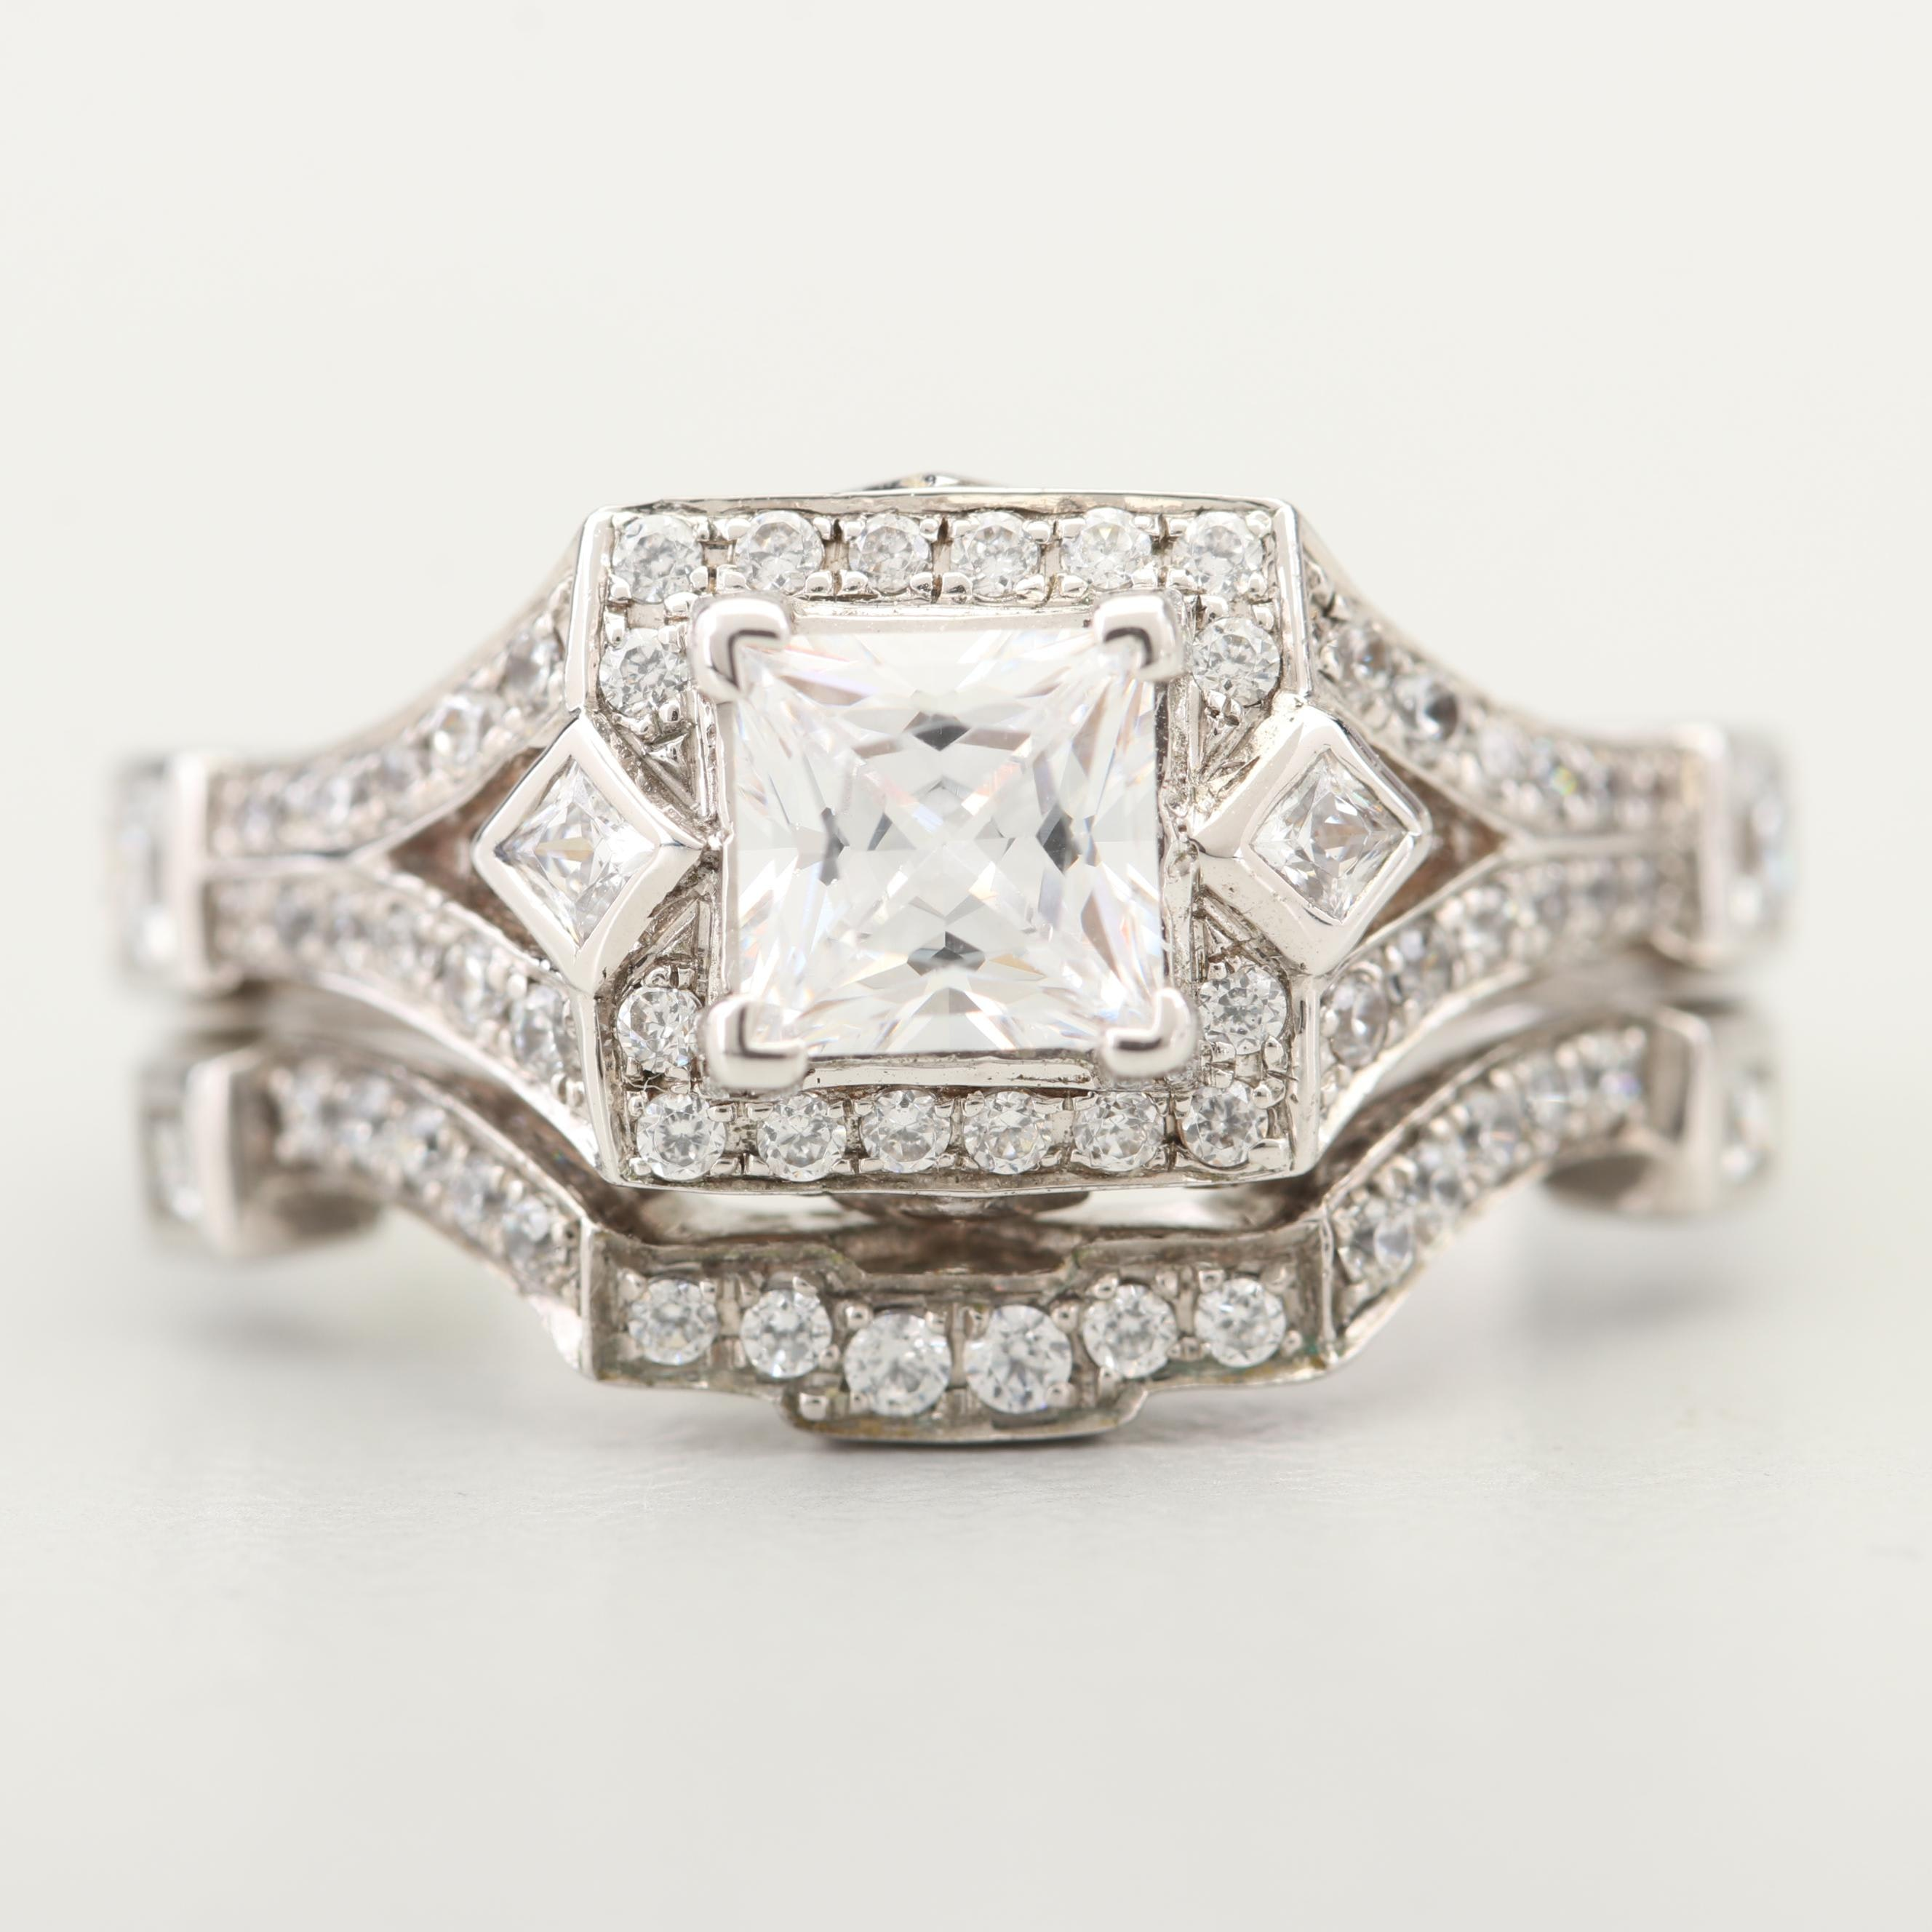 Silver Tone Cubic Zirconia Bridal Set